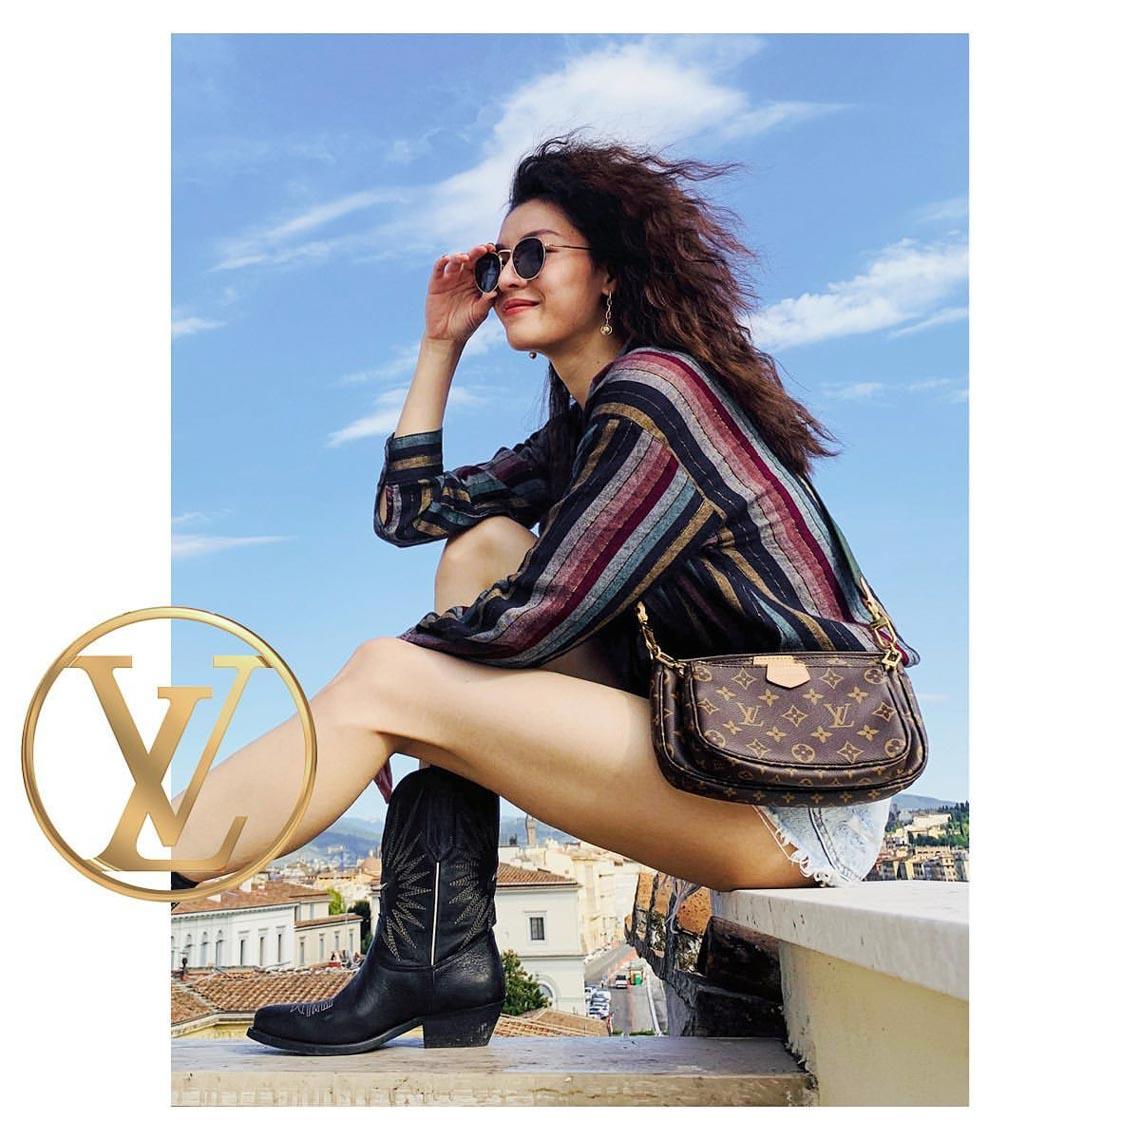 Multi Pochette - mẫu túi biến tấu mới của nhà Louis Vuitton - 6